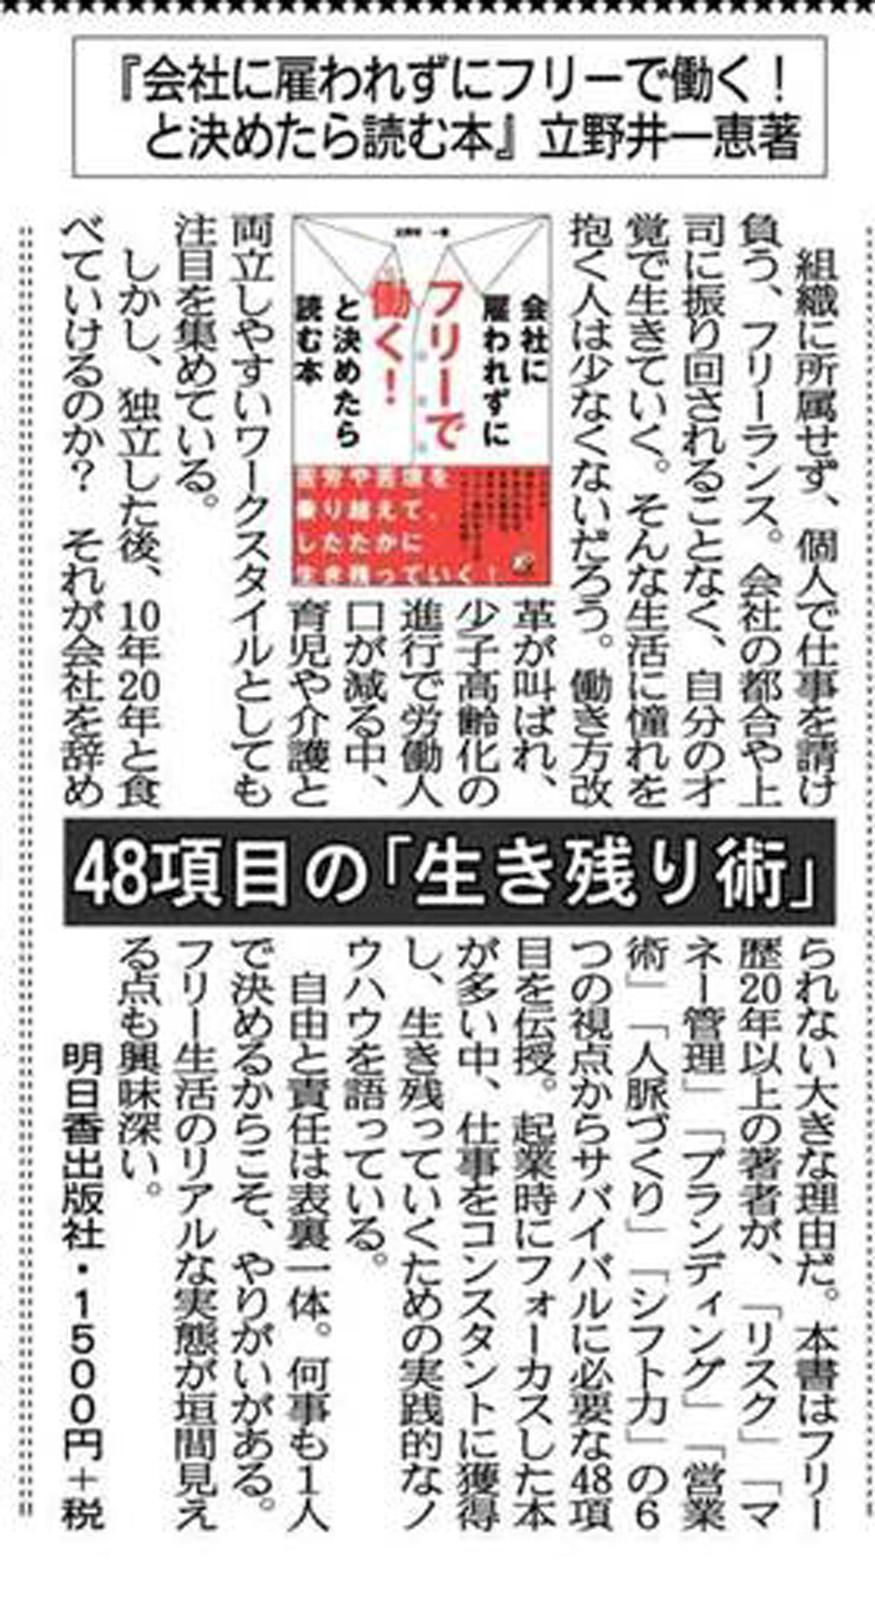 http://www.asuka-g.co.jp/event/c65cea4a77f8d1e8c9e898bd005f2669c941ceb1.jpg